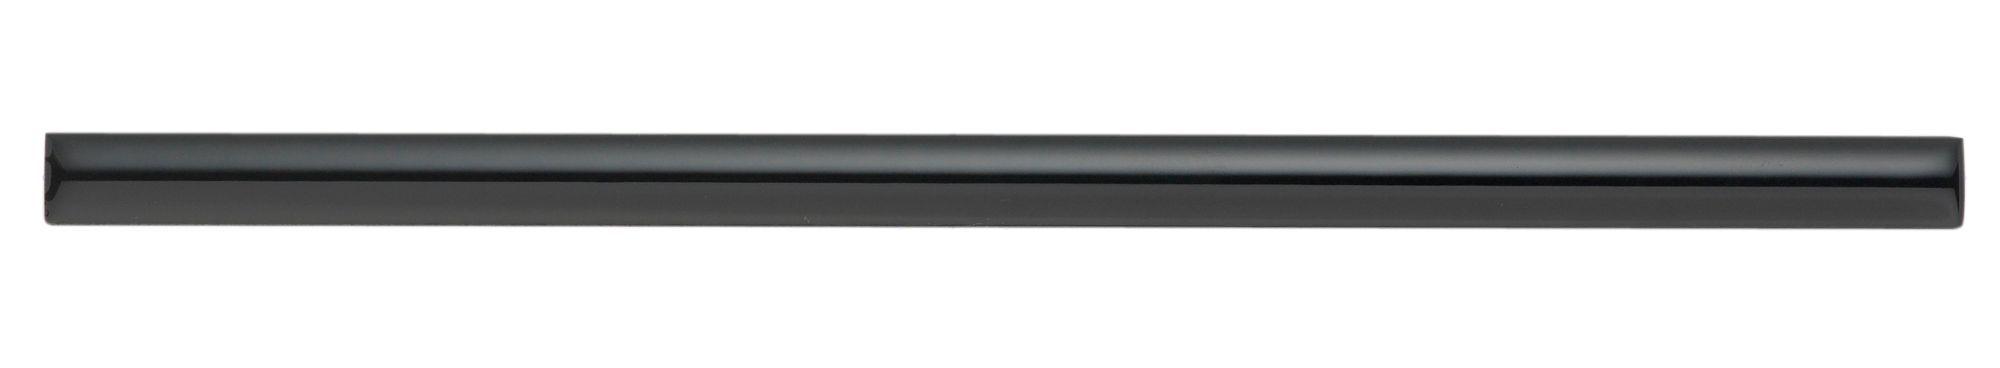 Pencil Black Ceramic Border Tile, (l)250mm (w)12mm